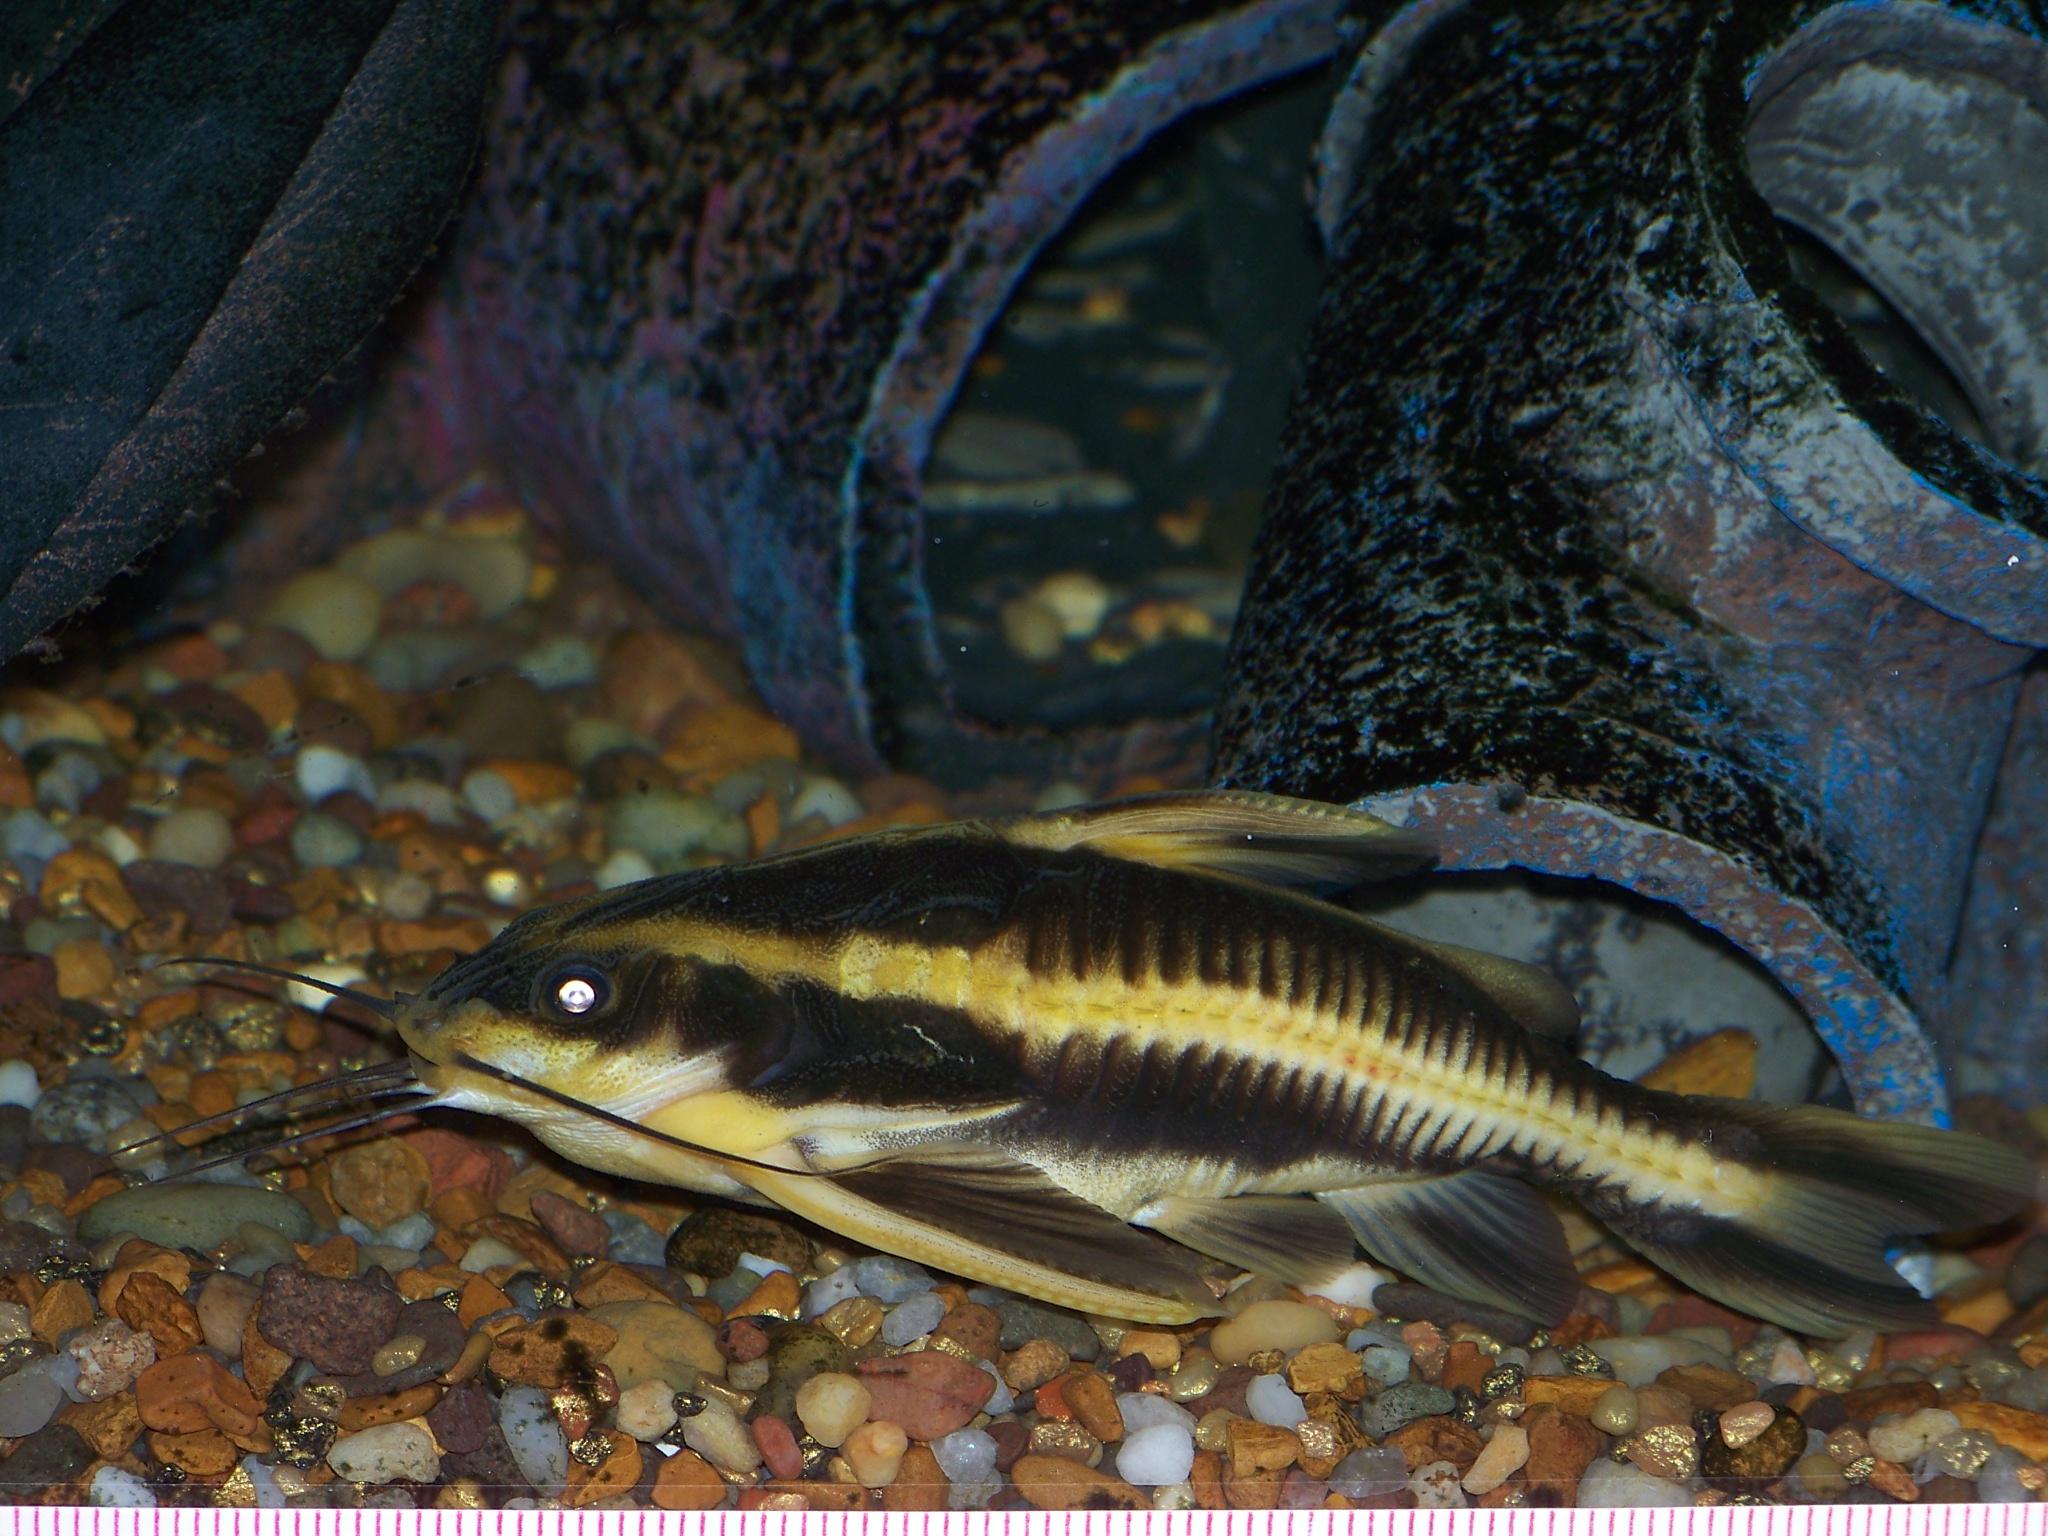 Striped raphael fish